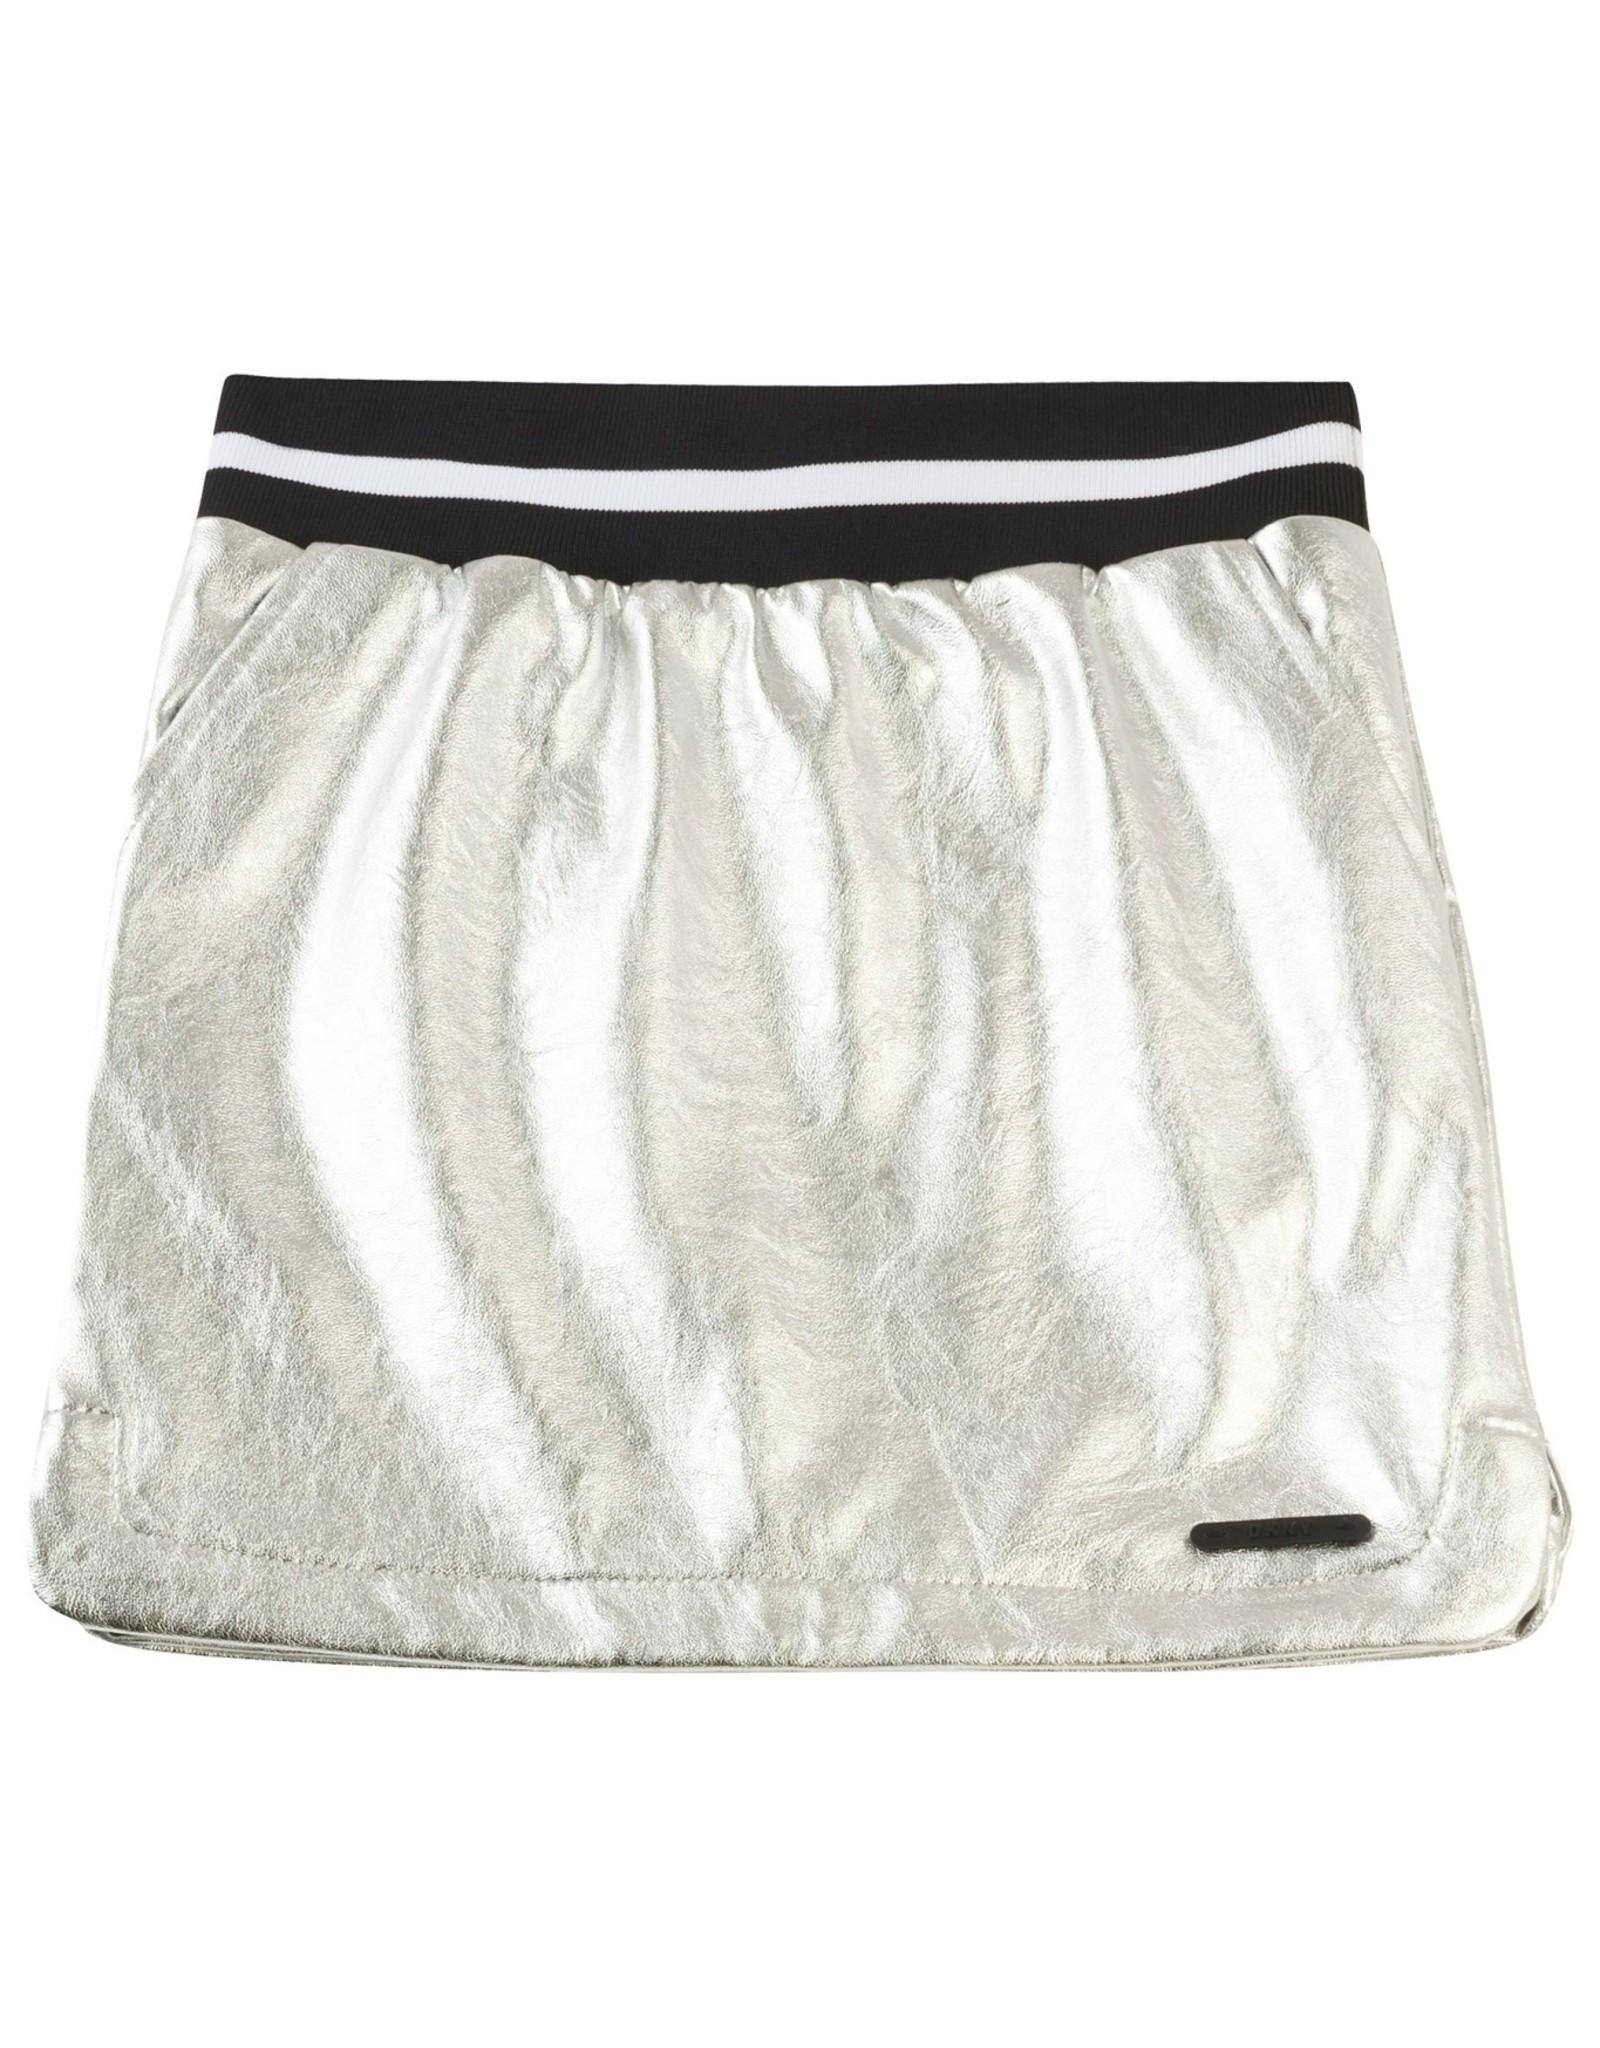 DKNY Skirt Silver mt 14